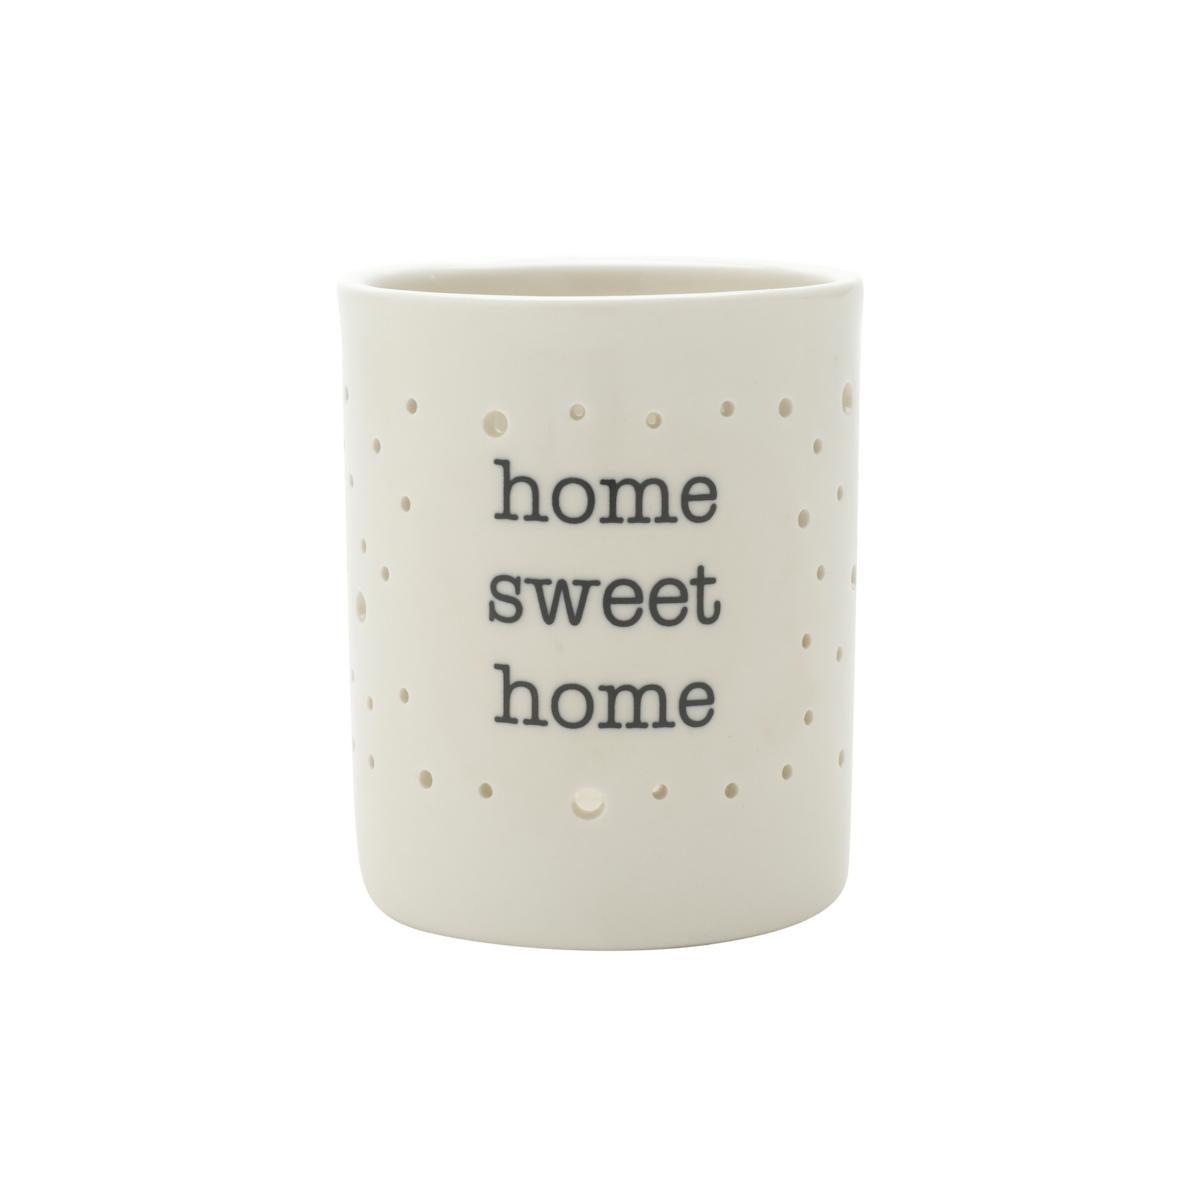 Home Sweet Home - Porta Velas / Lanterna